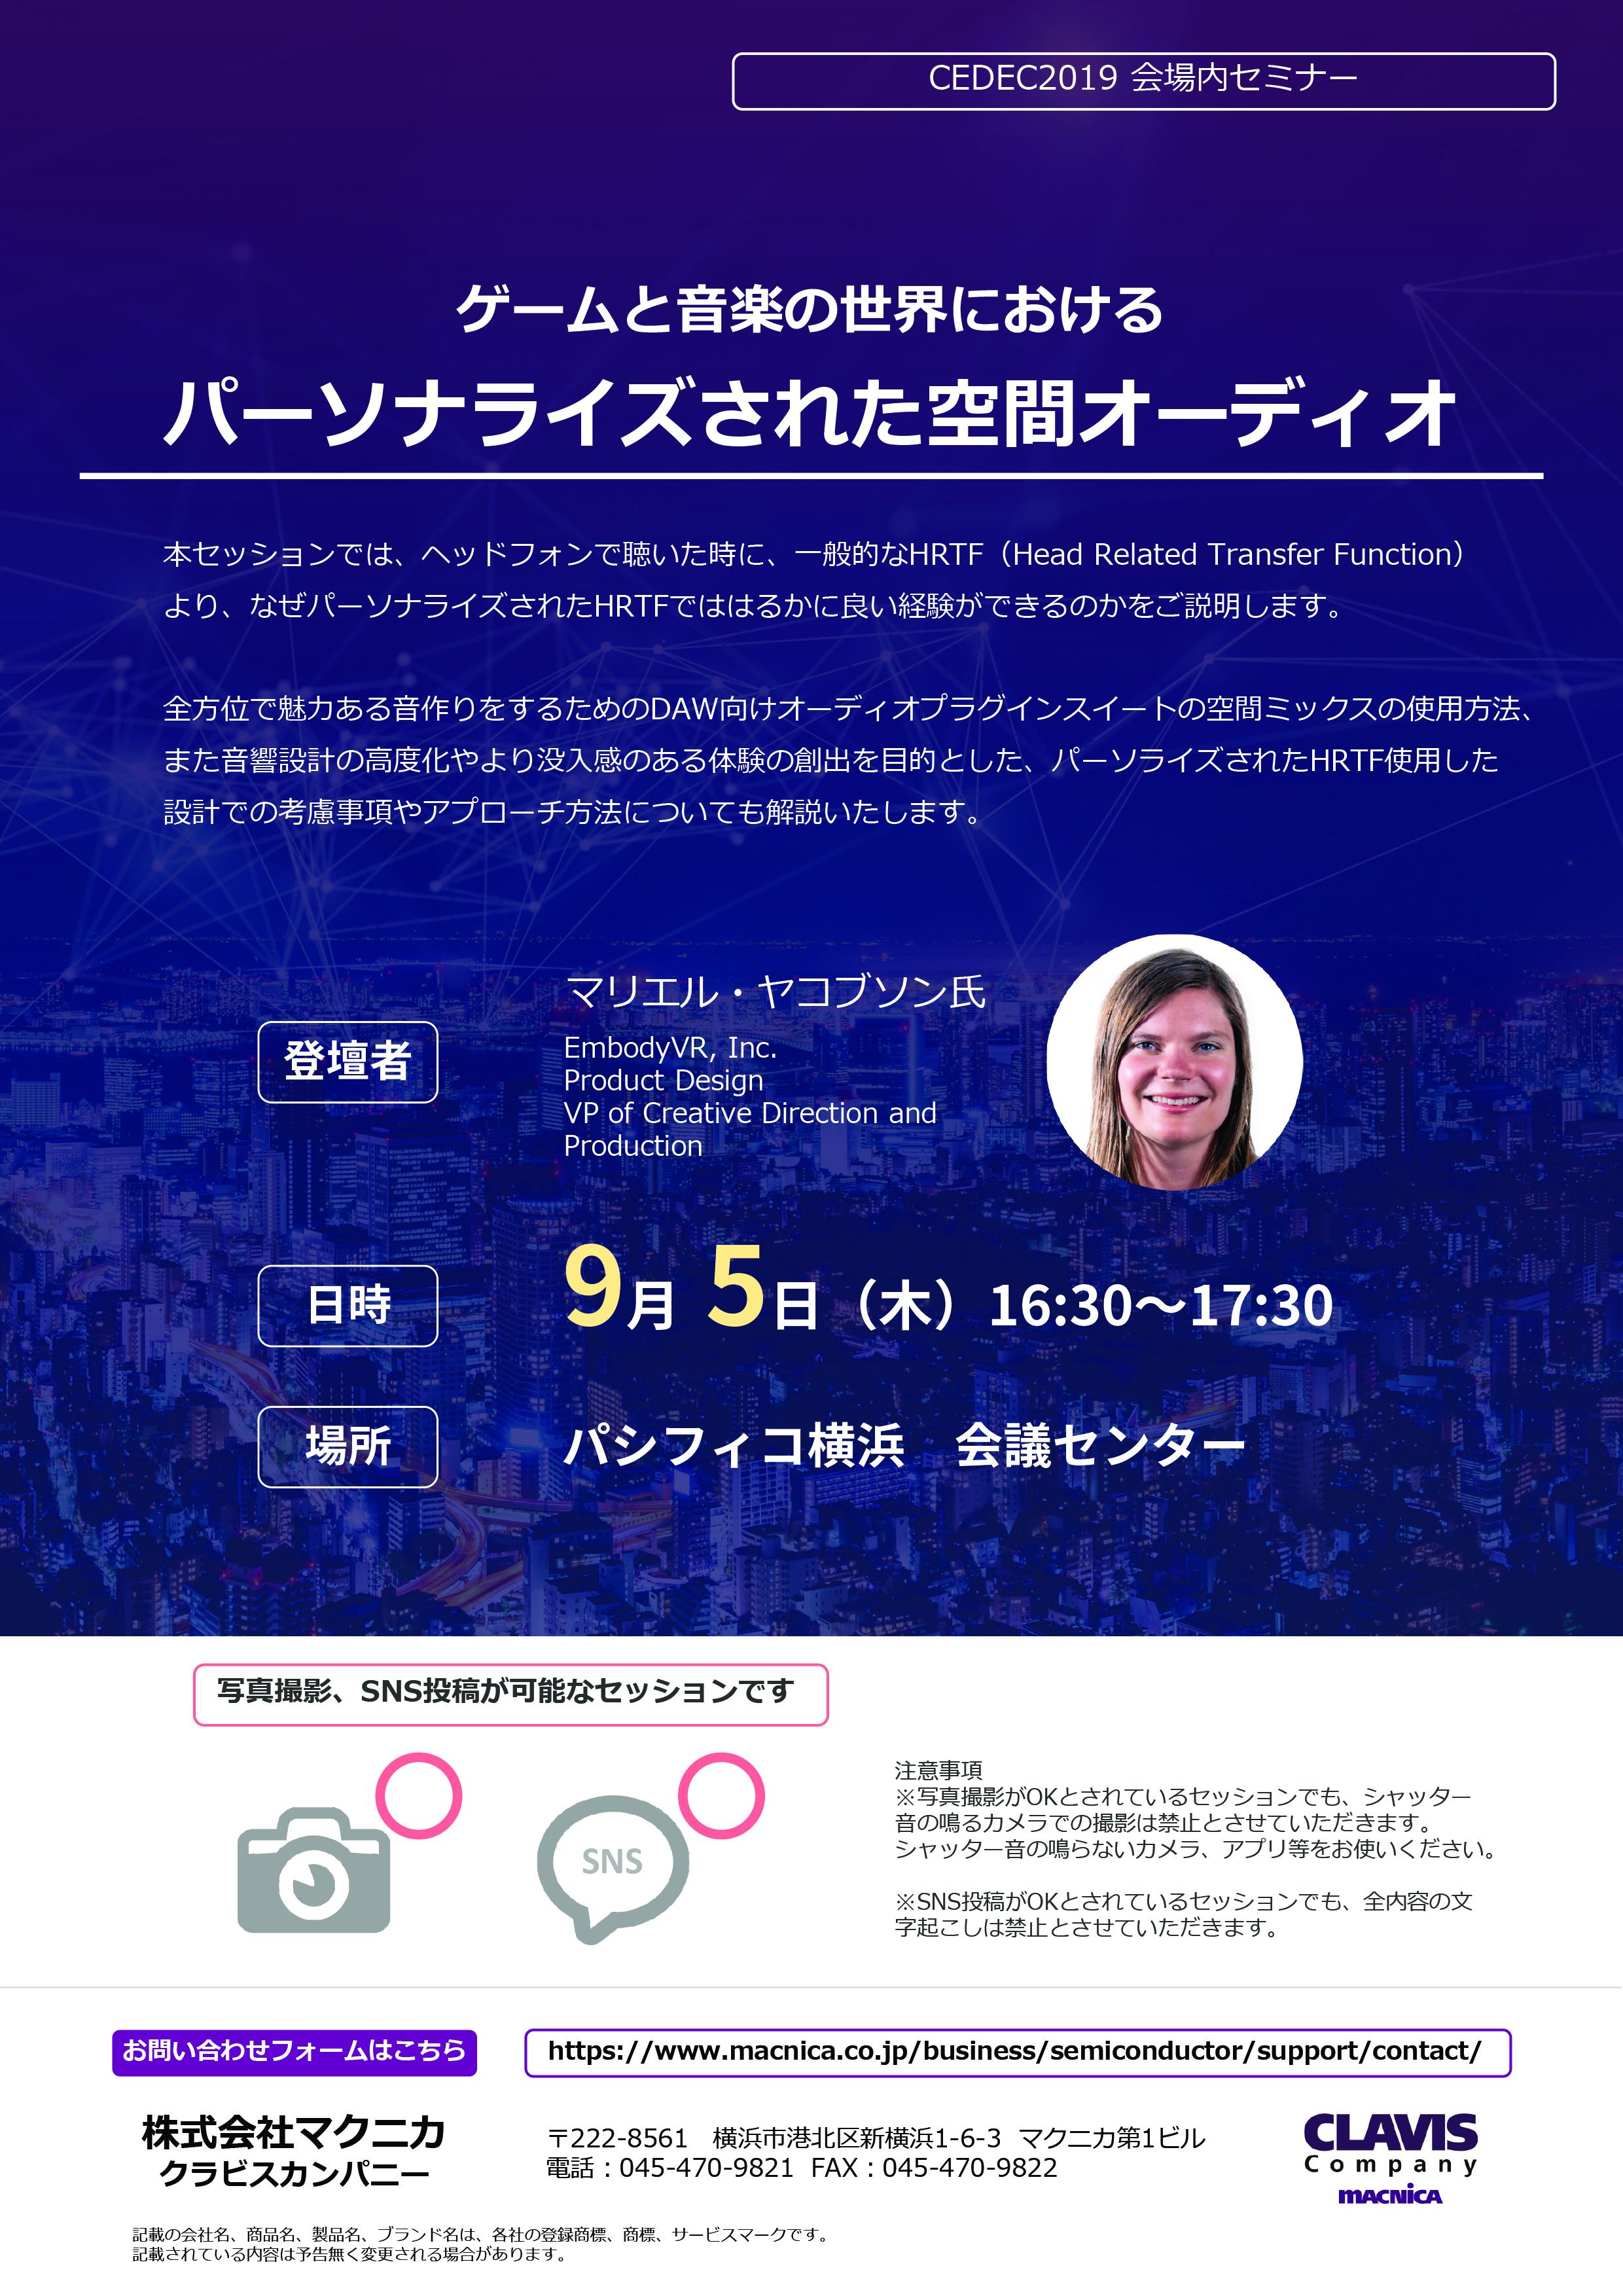 201909_CEDEC_session.jpg